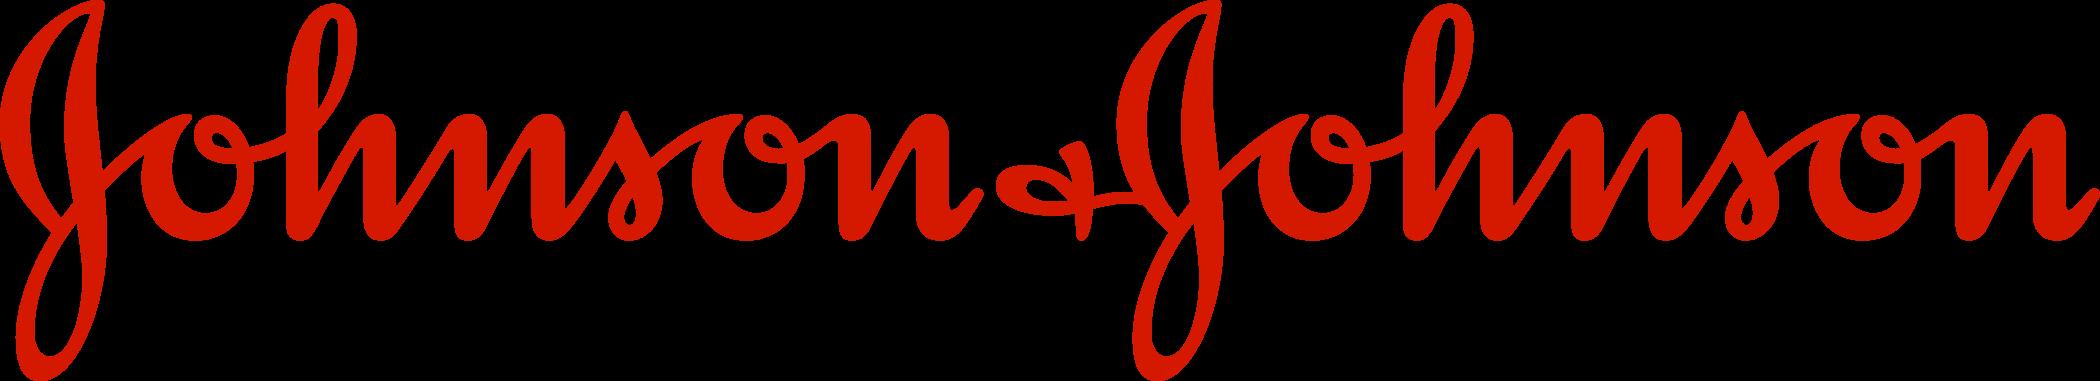 johnson and johnson 1 - Johnson & Johnson Logo